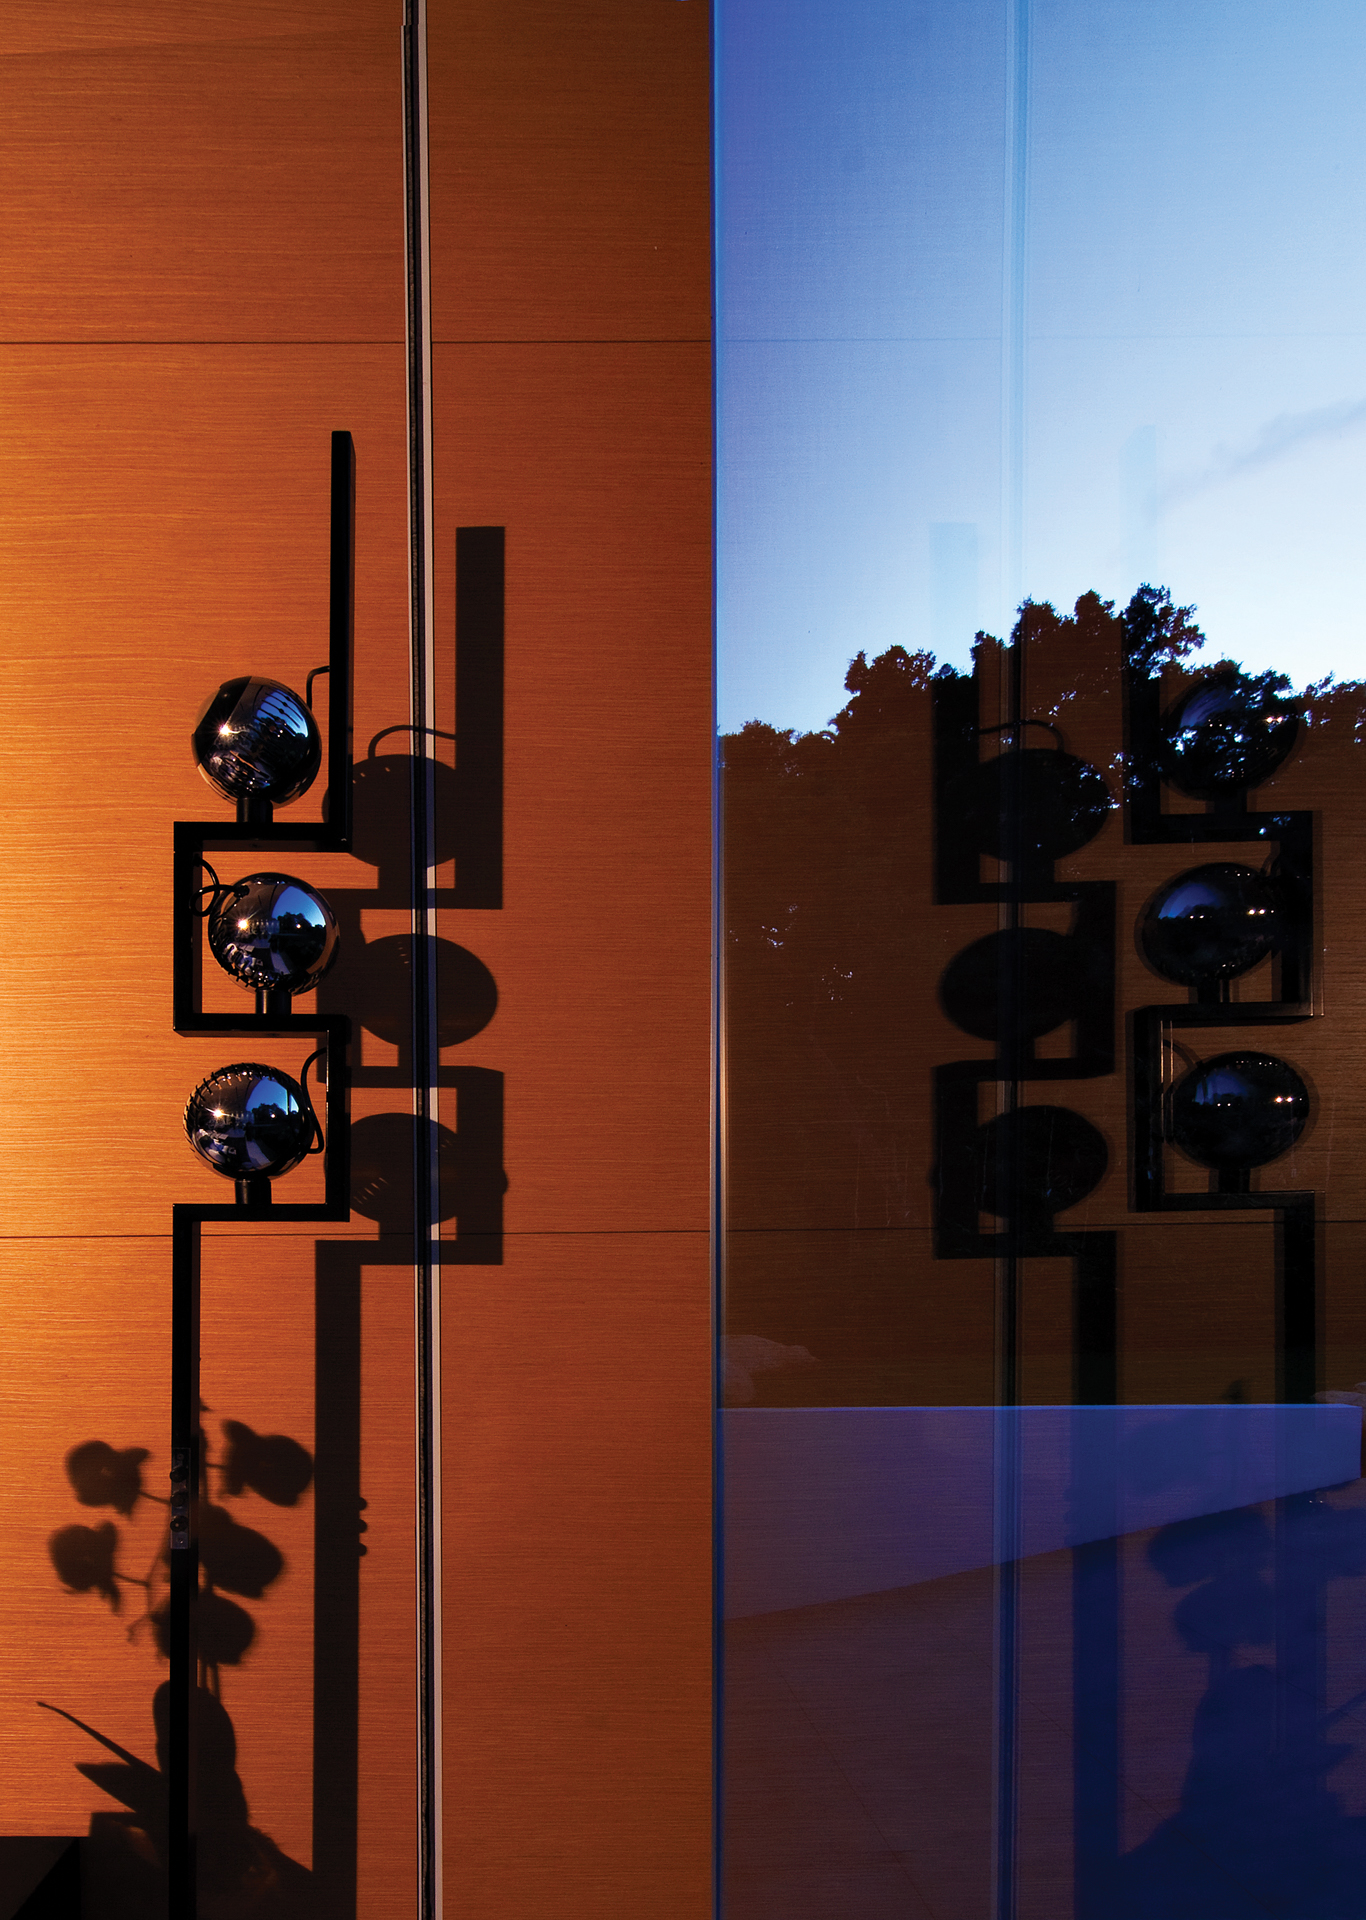 Glass Pavilion, Santa Barbara, CA • Architect & Designer Steve Hermann • Photographer Savannah Wishart • Images for use in Lux Magazine, Portugal.